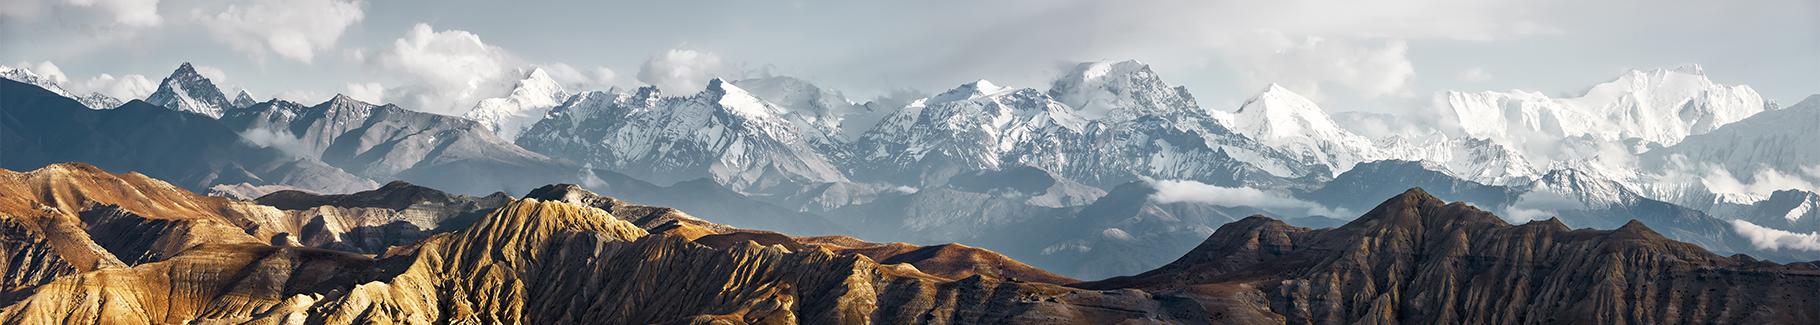 Zimowa fototapeta góry